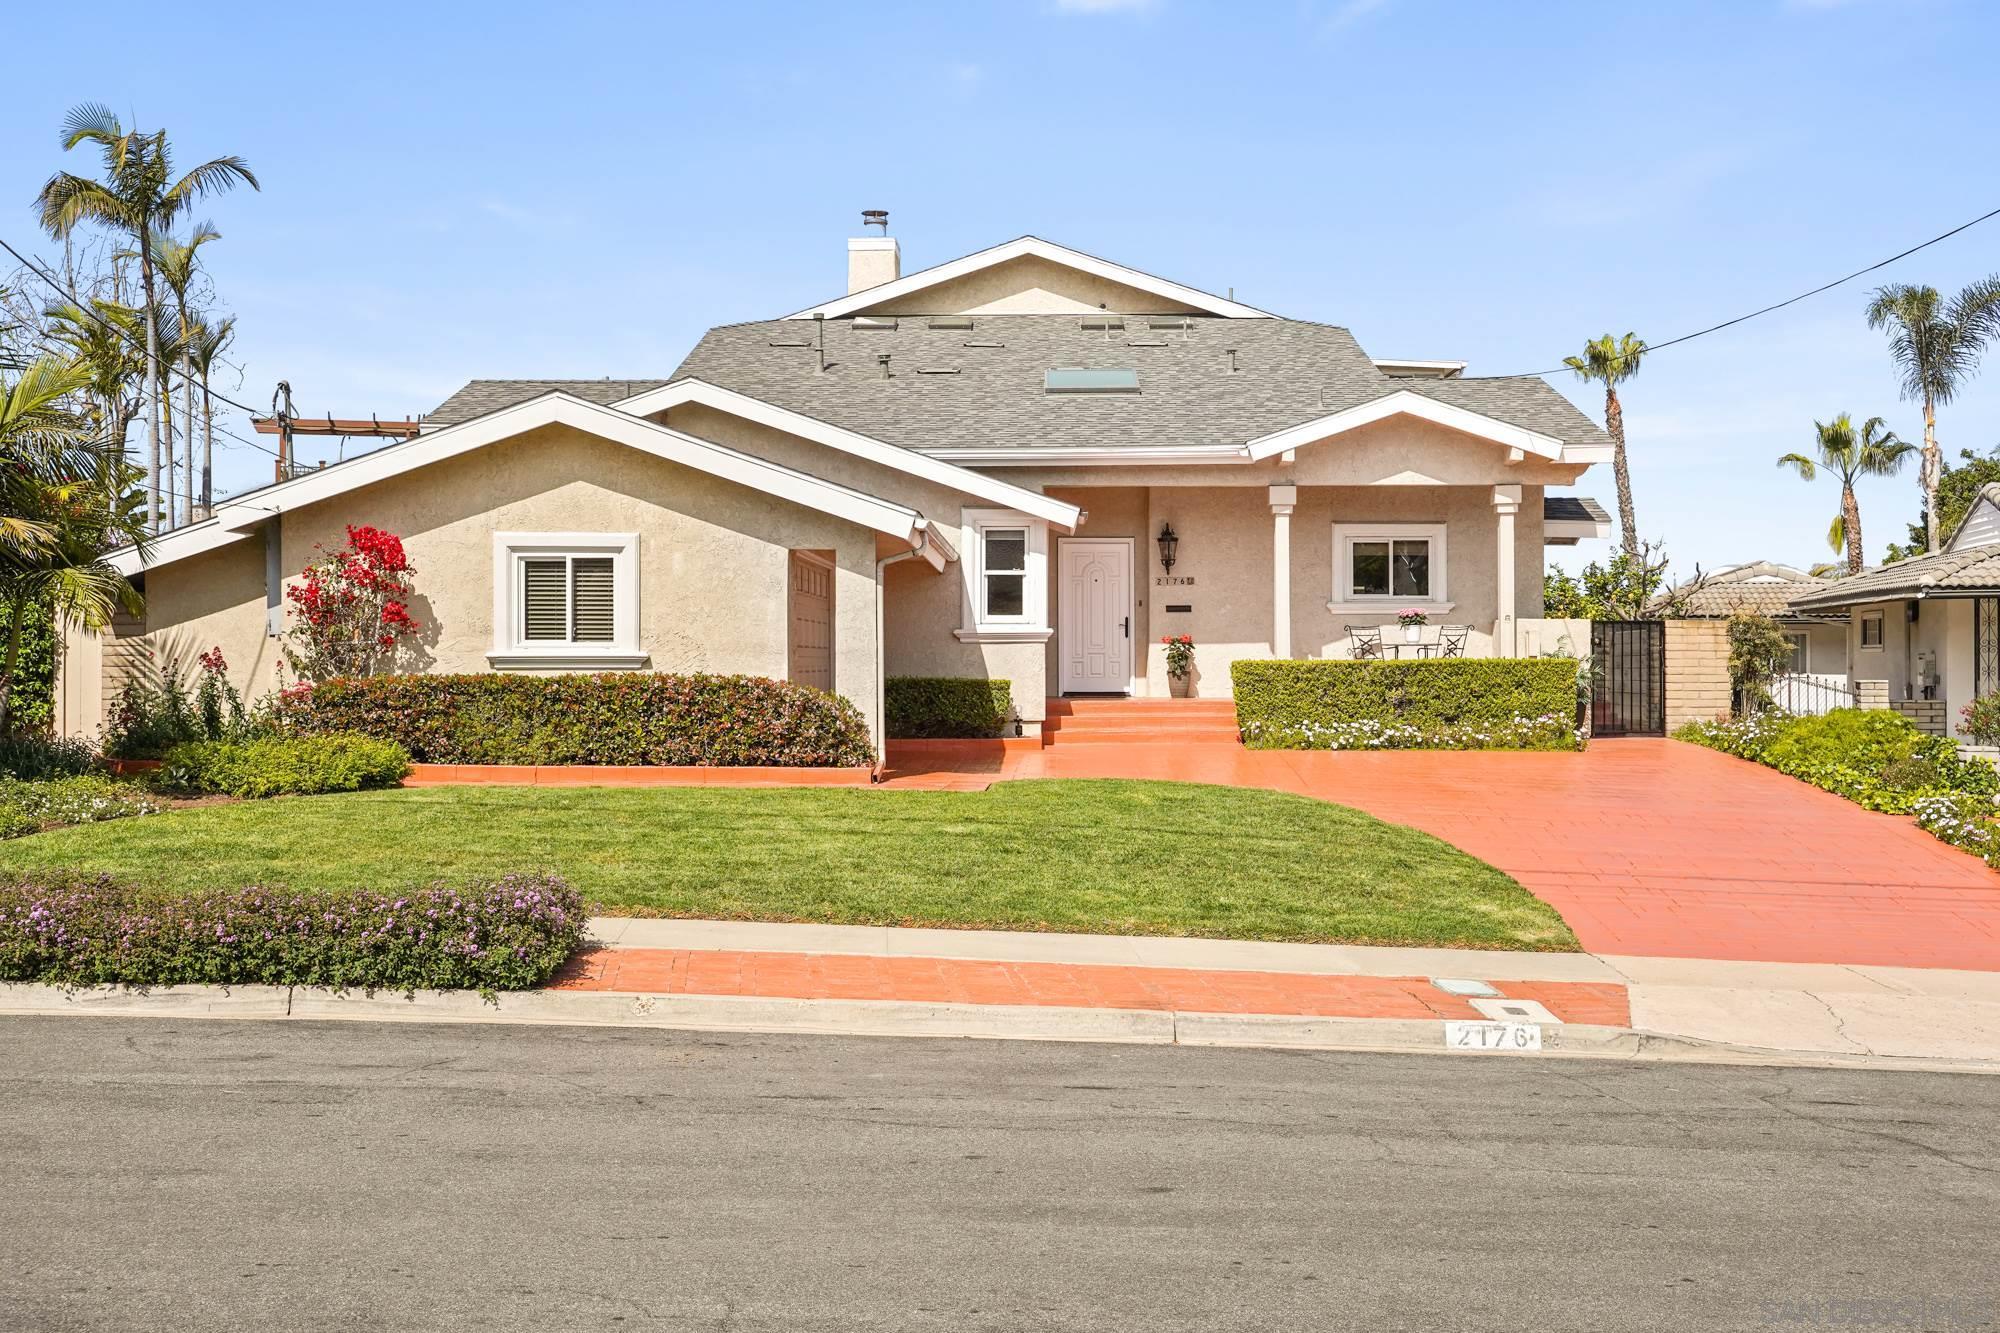 2176 Dunhaven St, San Diego, CA 92110